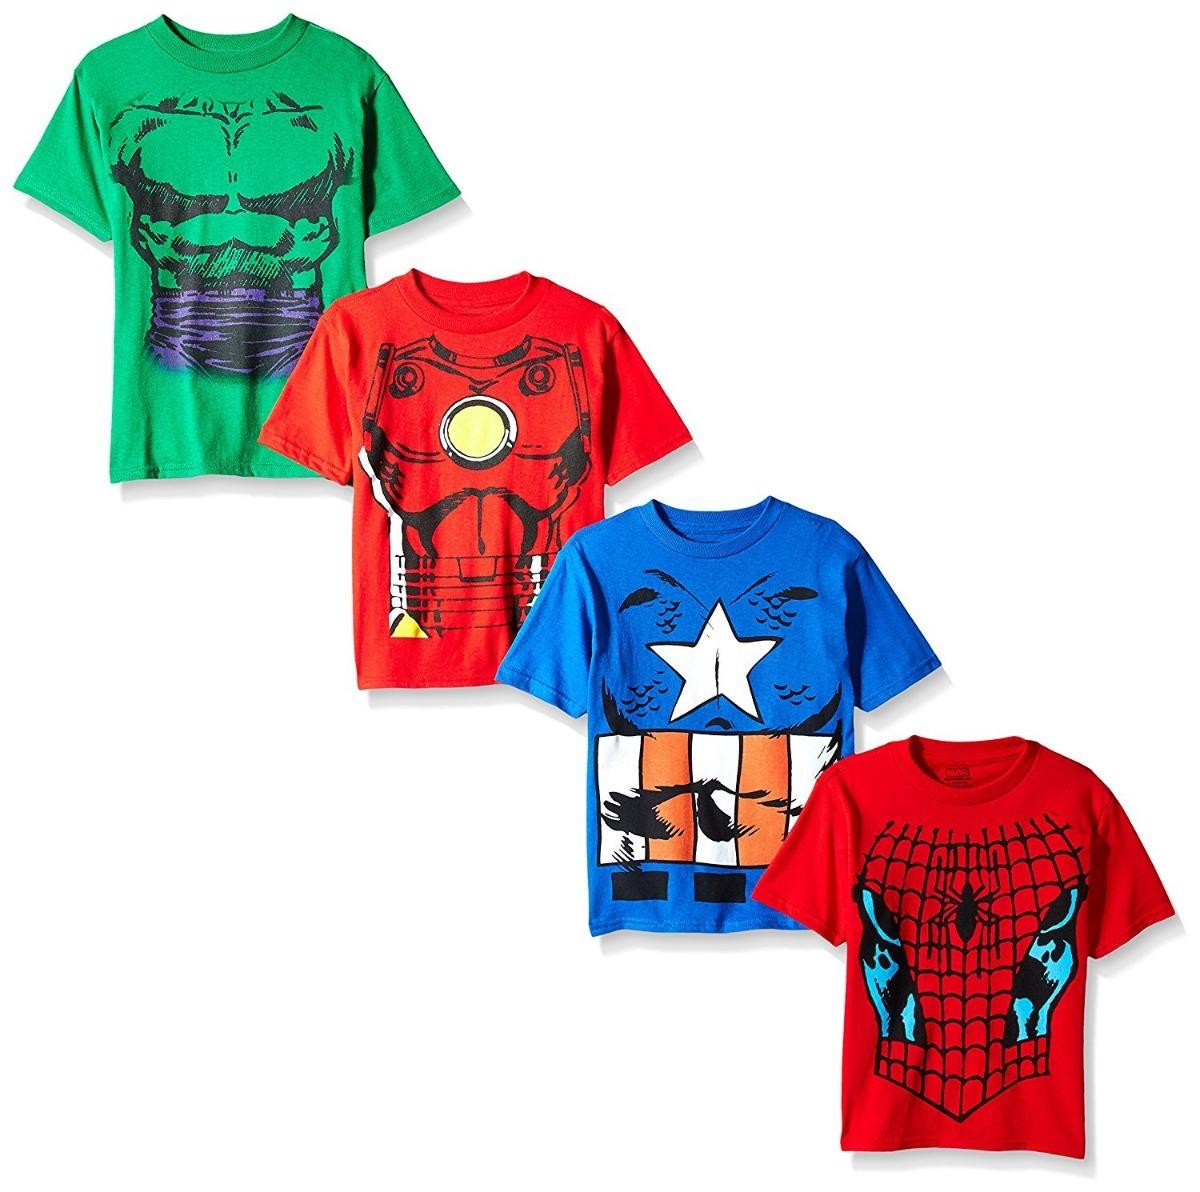 26a796888 camisetas niño 4 spiderman capitan america hulk marvel. Cargando zoom.